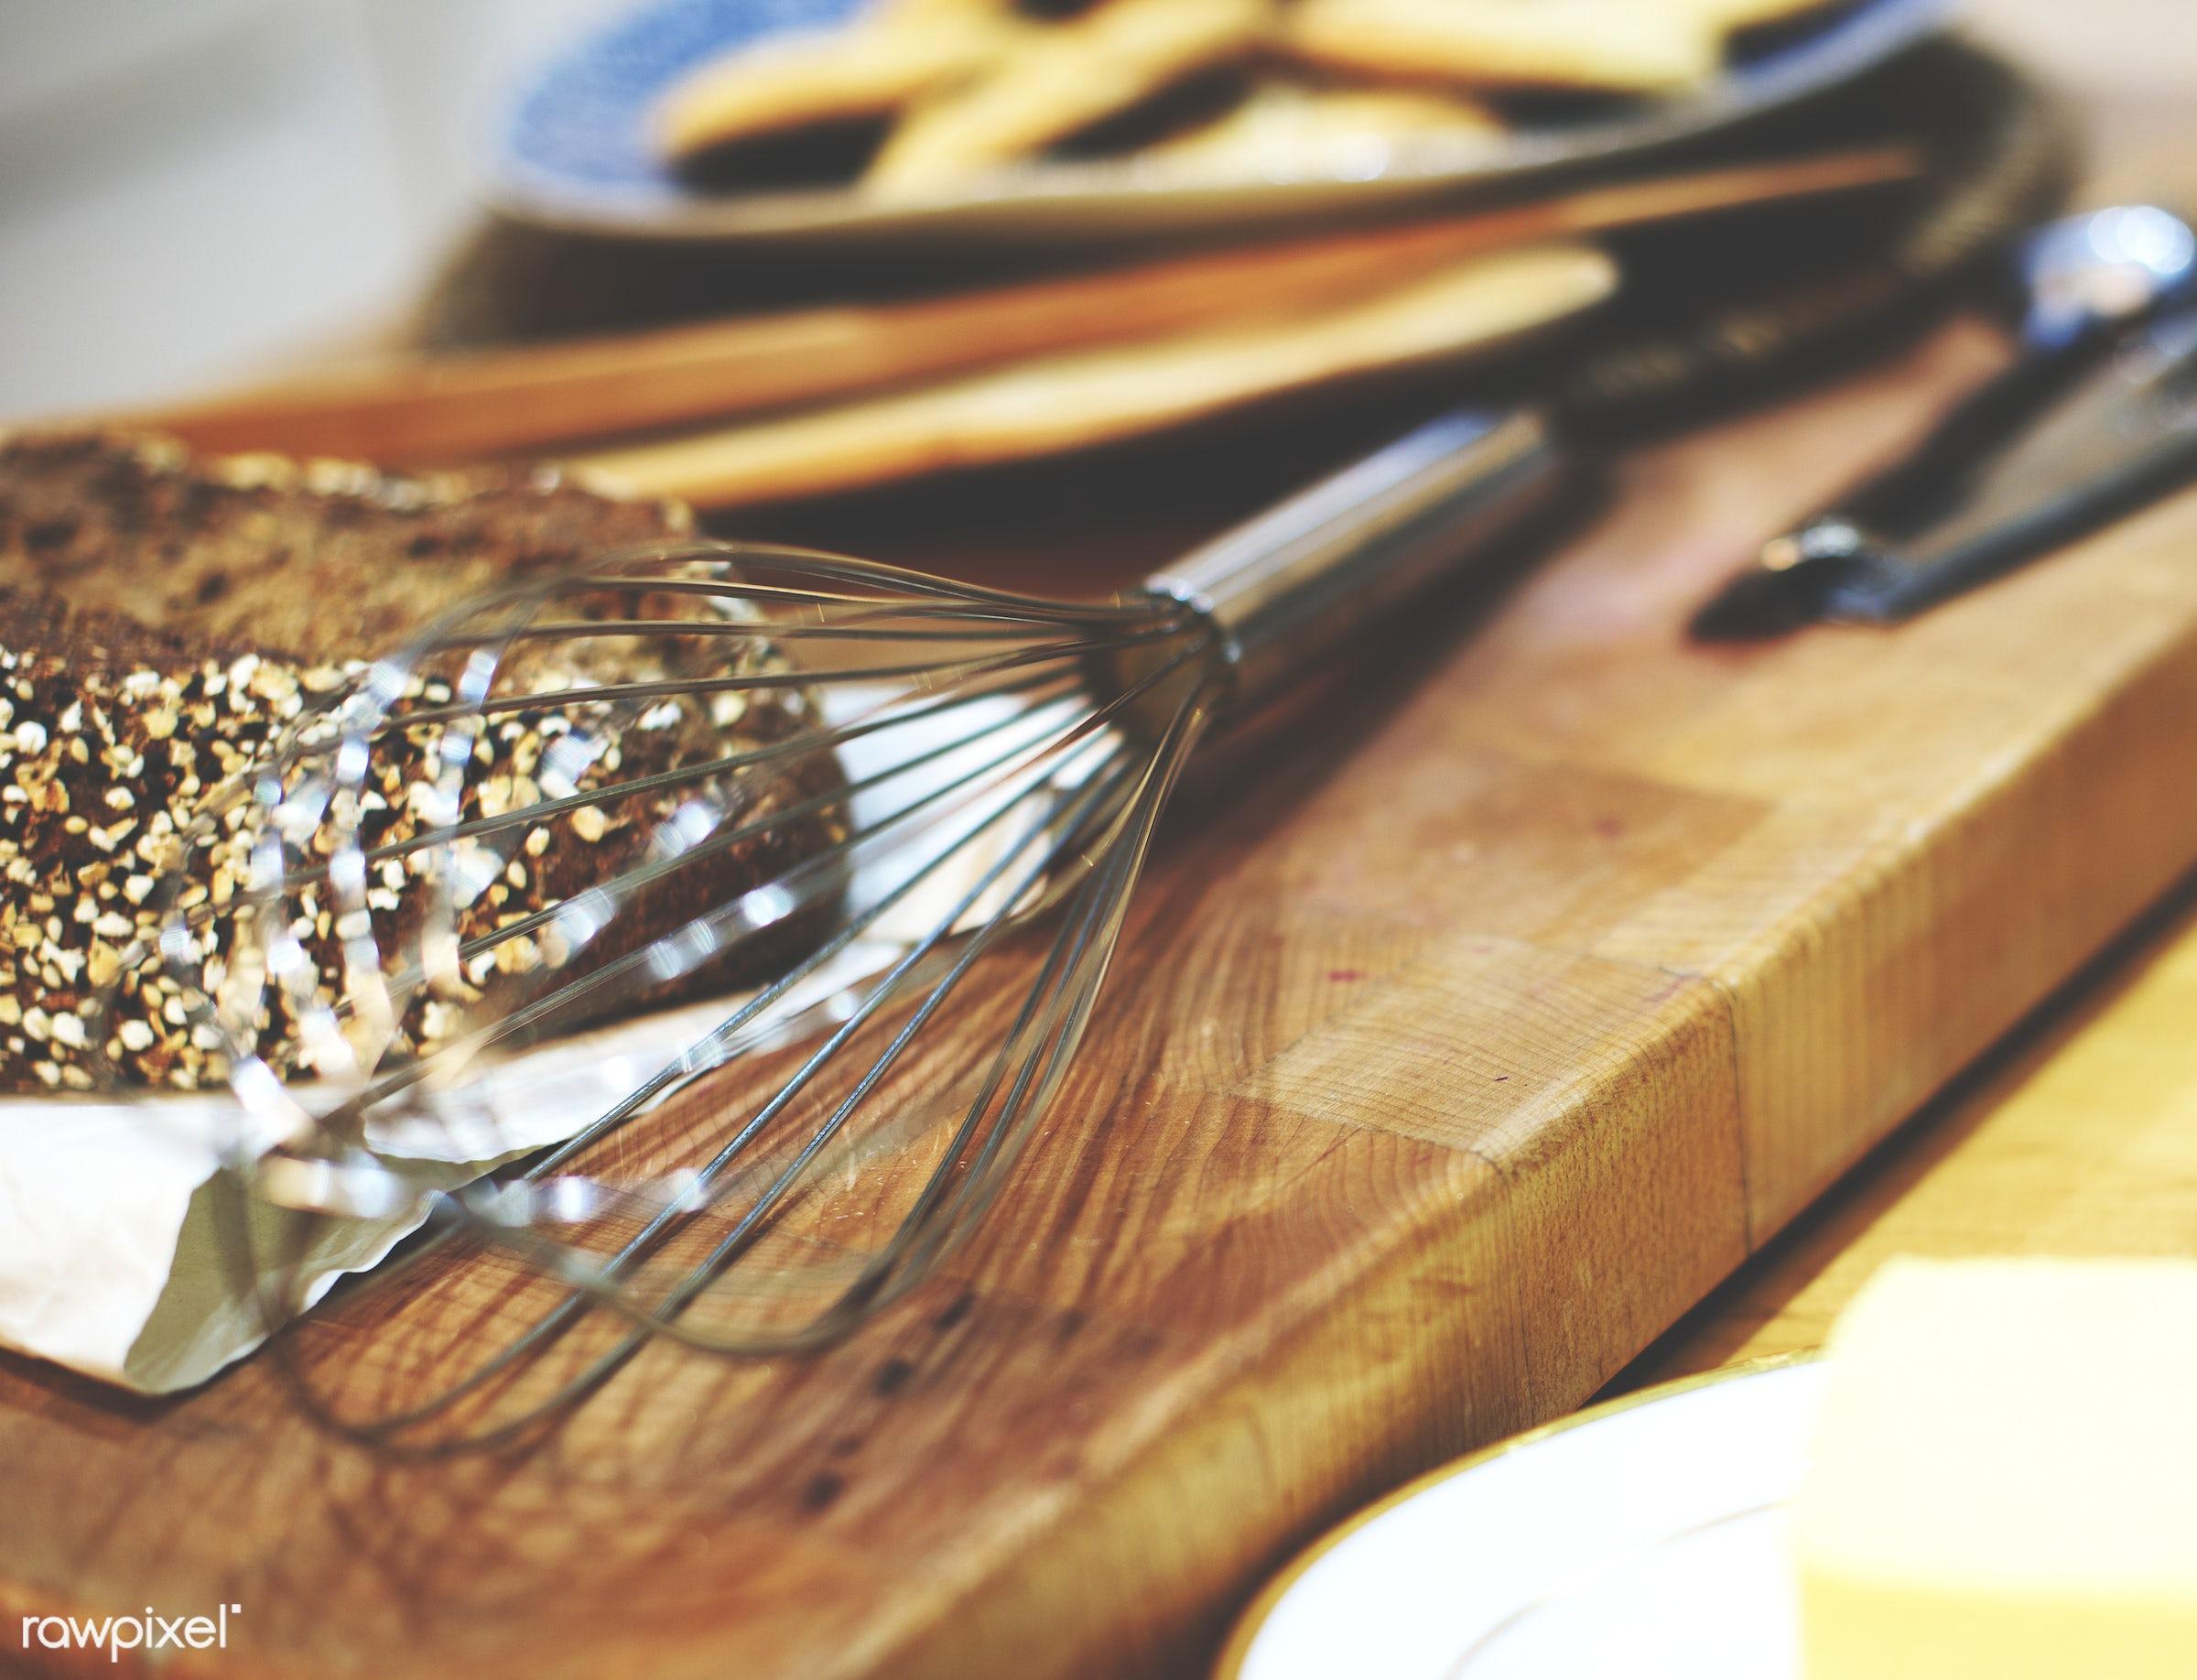 bakery, kitchen, restaurant, cooking, baking, recipe, bake, bake shop, cook, cookies, cutlery, delicious, eggs, equipment,...